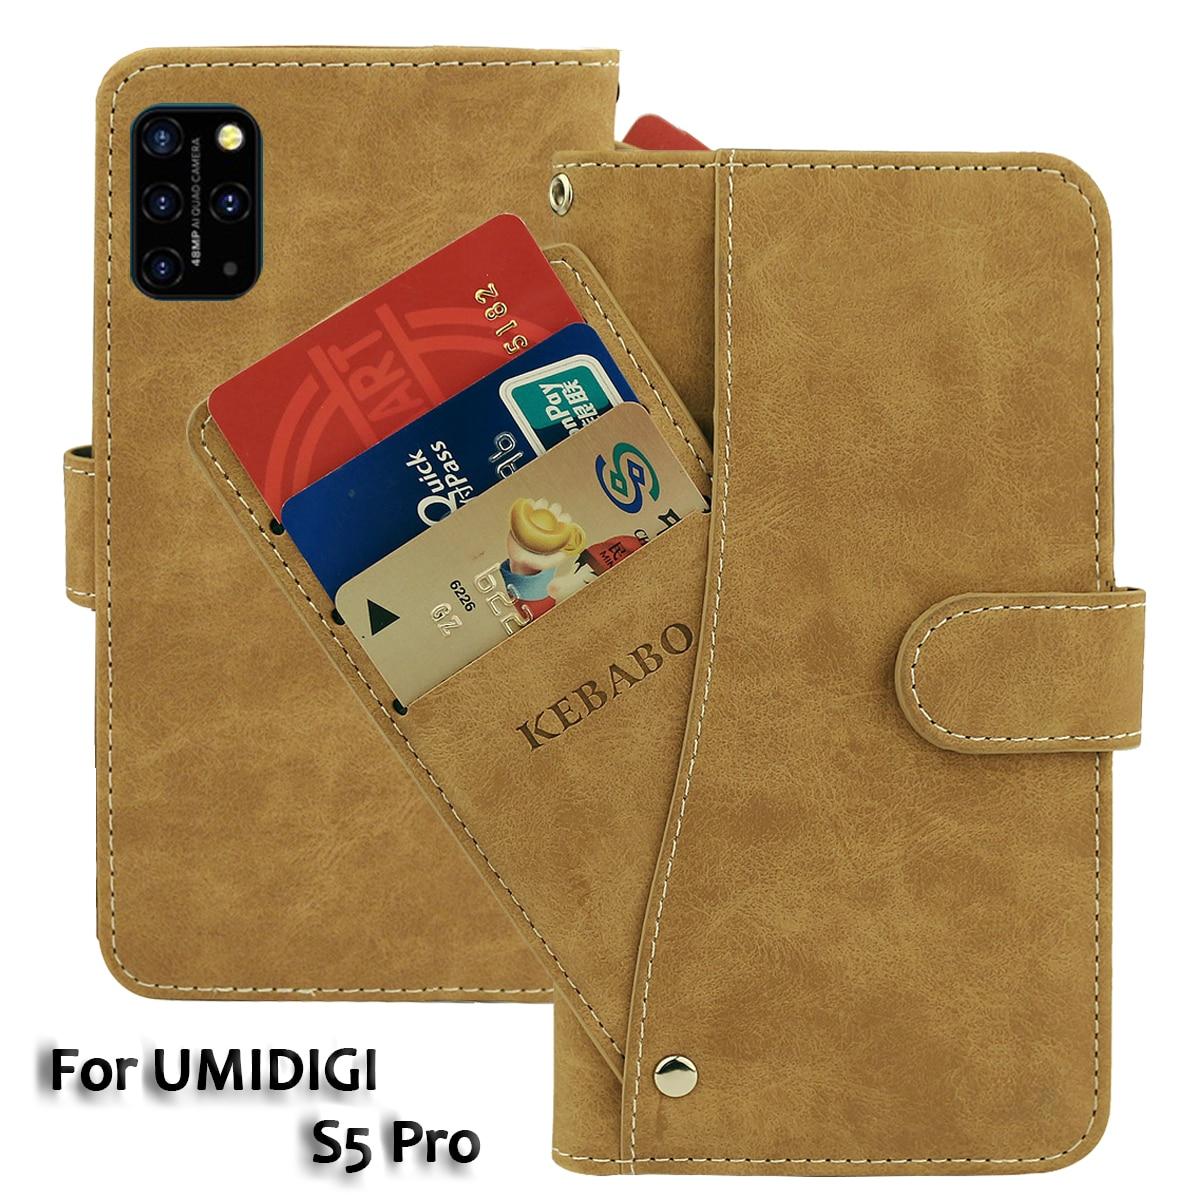 "Cartera de cuero Vintage UMIDIGI S5 Pro Case 6,39 ""Flip lujo funda con ranuras para tarjetas imán Fundas protectoras de teléfono"